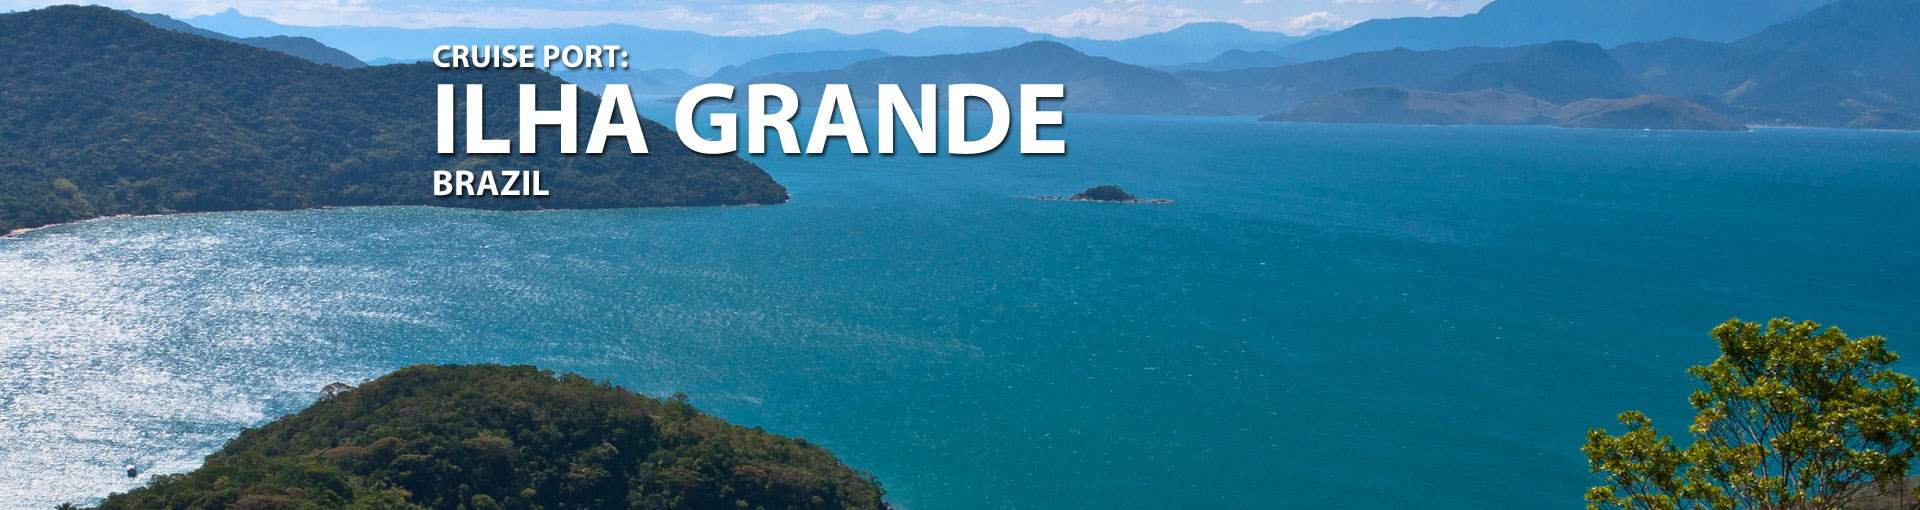 Cruises to ilha Grande(Rio De Janeiro), Brazil